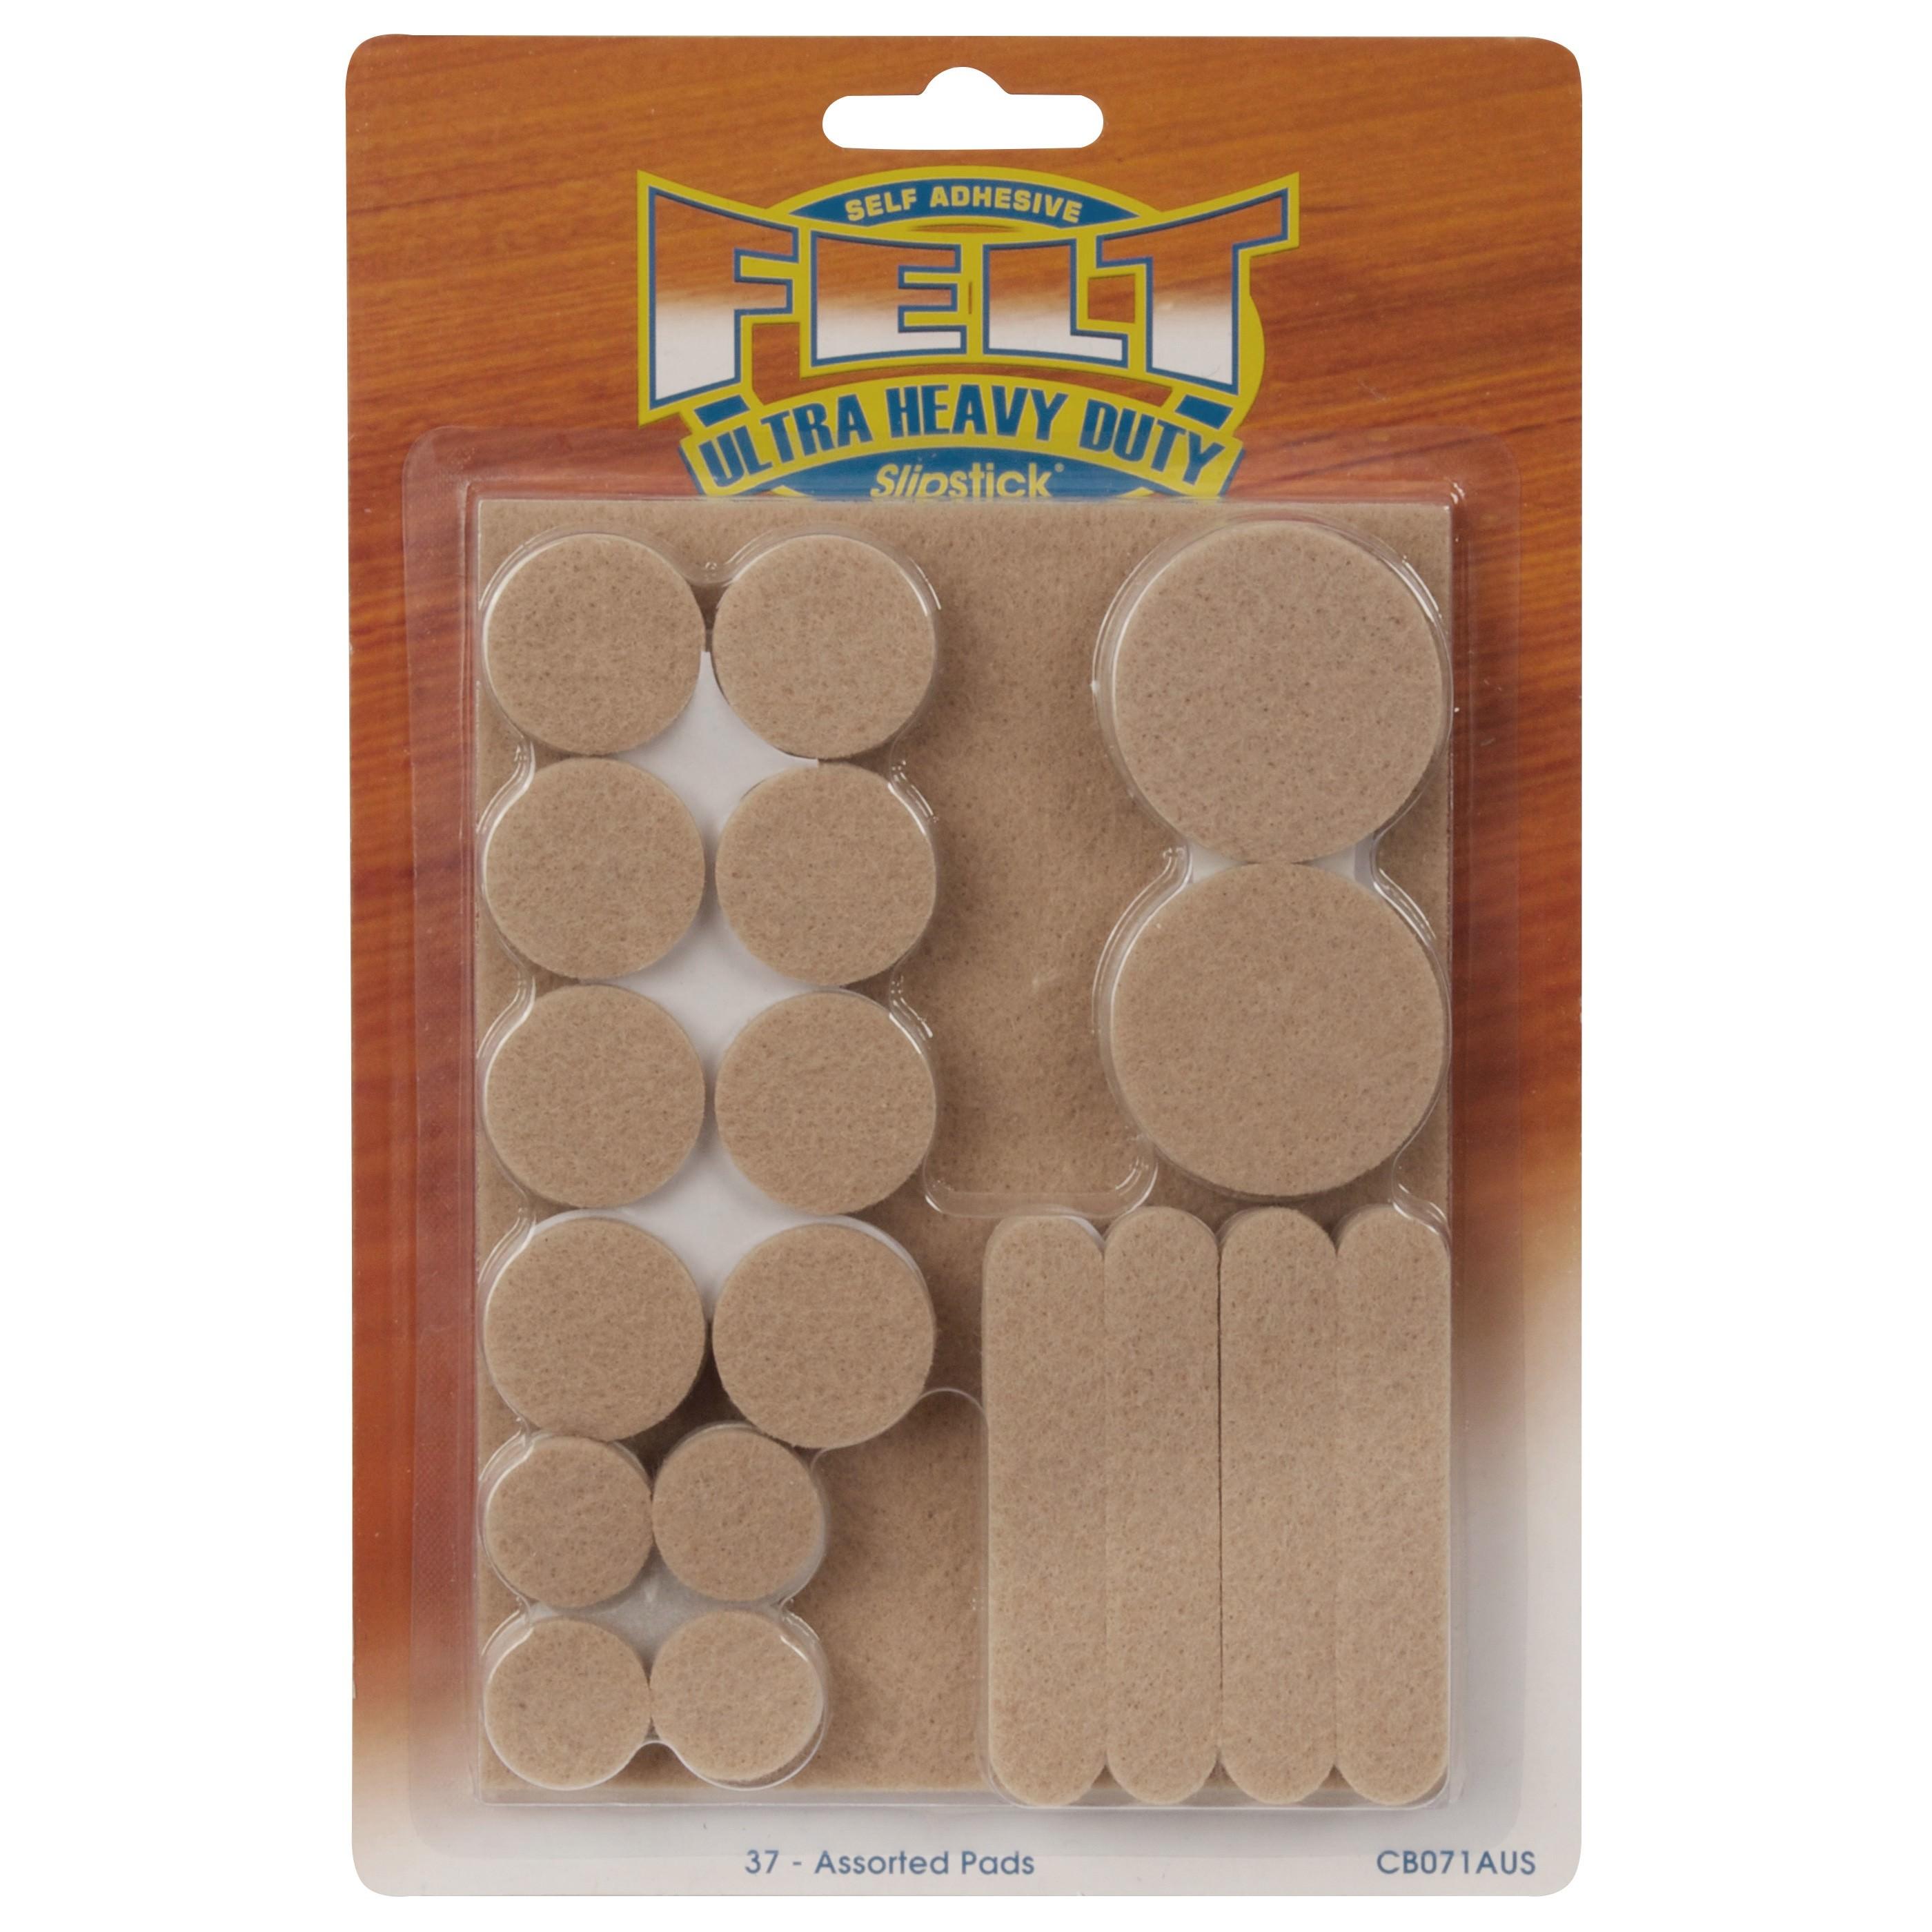 Slipstick Assorted Heavy Duty Felt Pads, 37 Pack